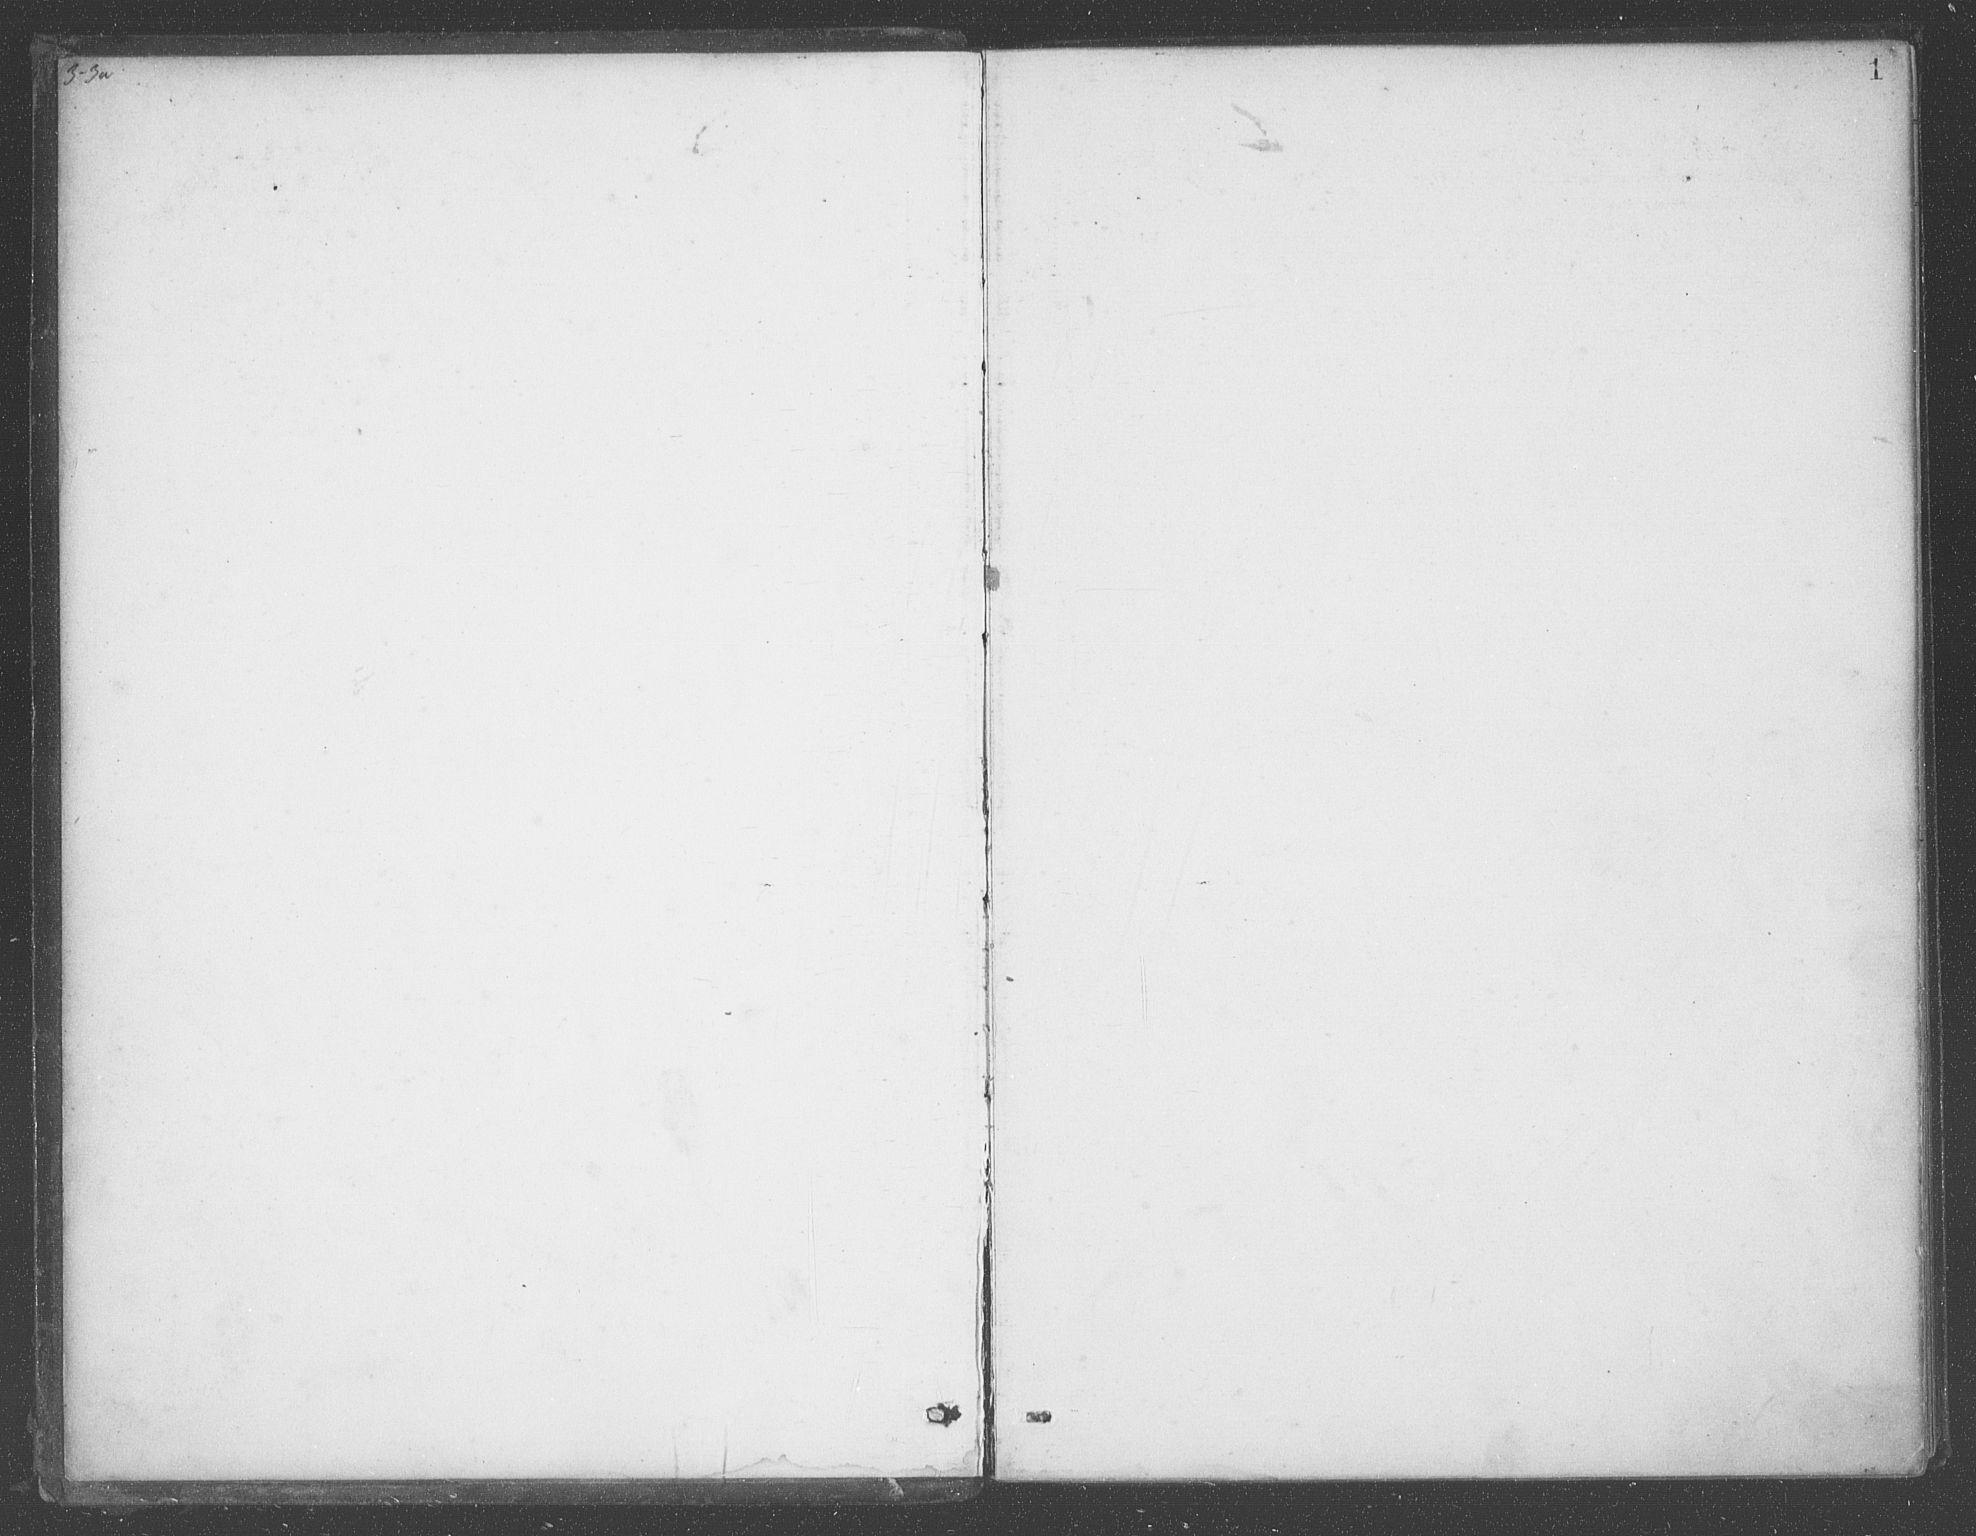 SAB, Aurland sokneprestembete, H/Ha/Had/L0001: Ministerialbok nr. D  1, 1880-1903, s. 1